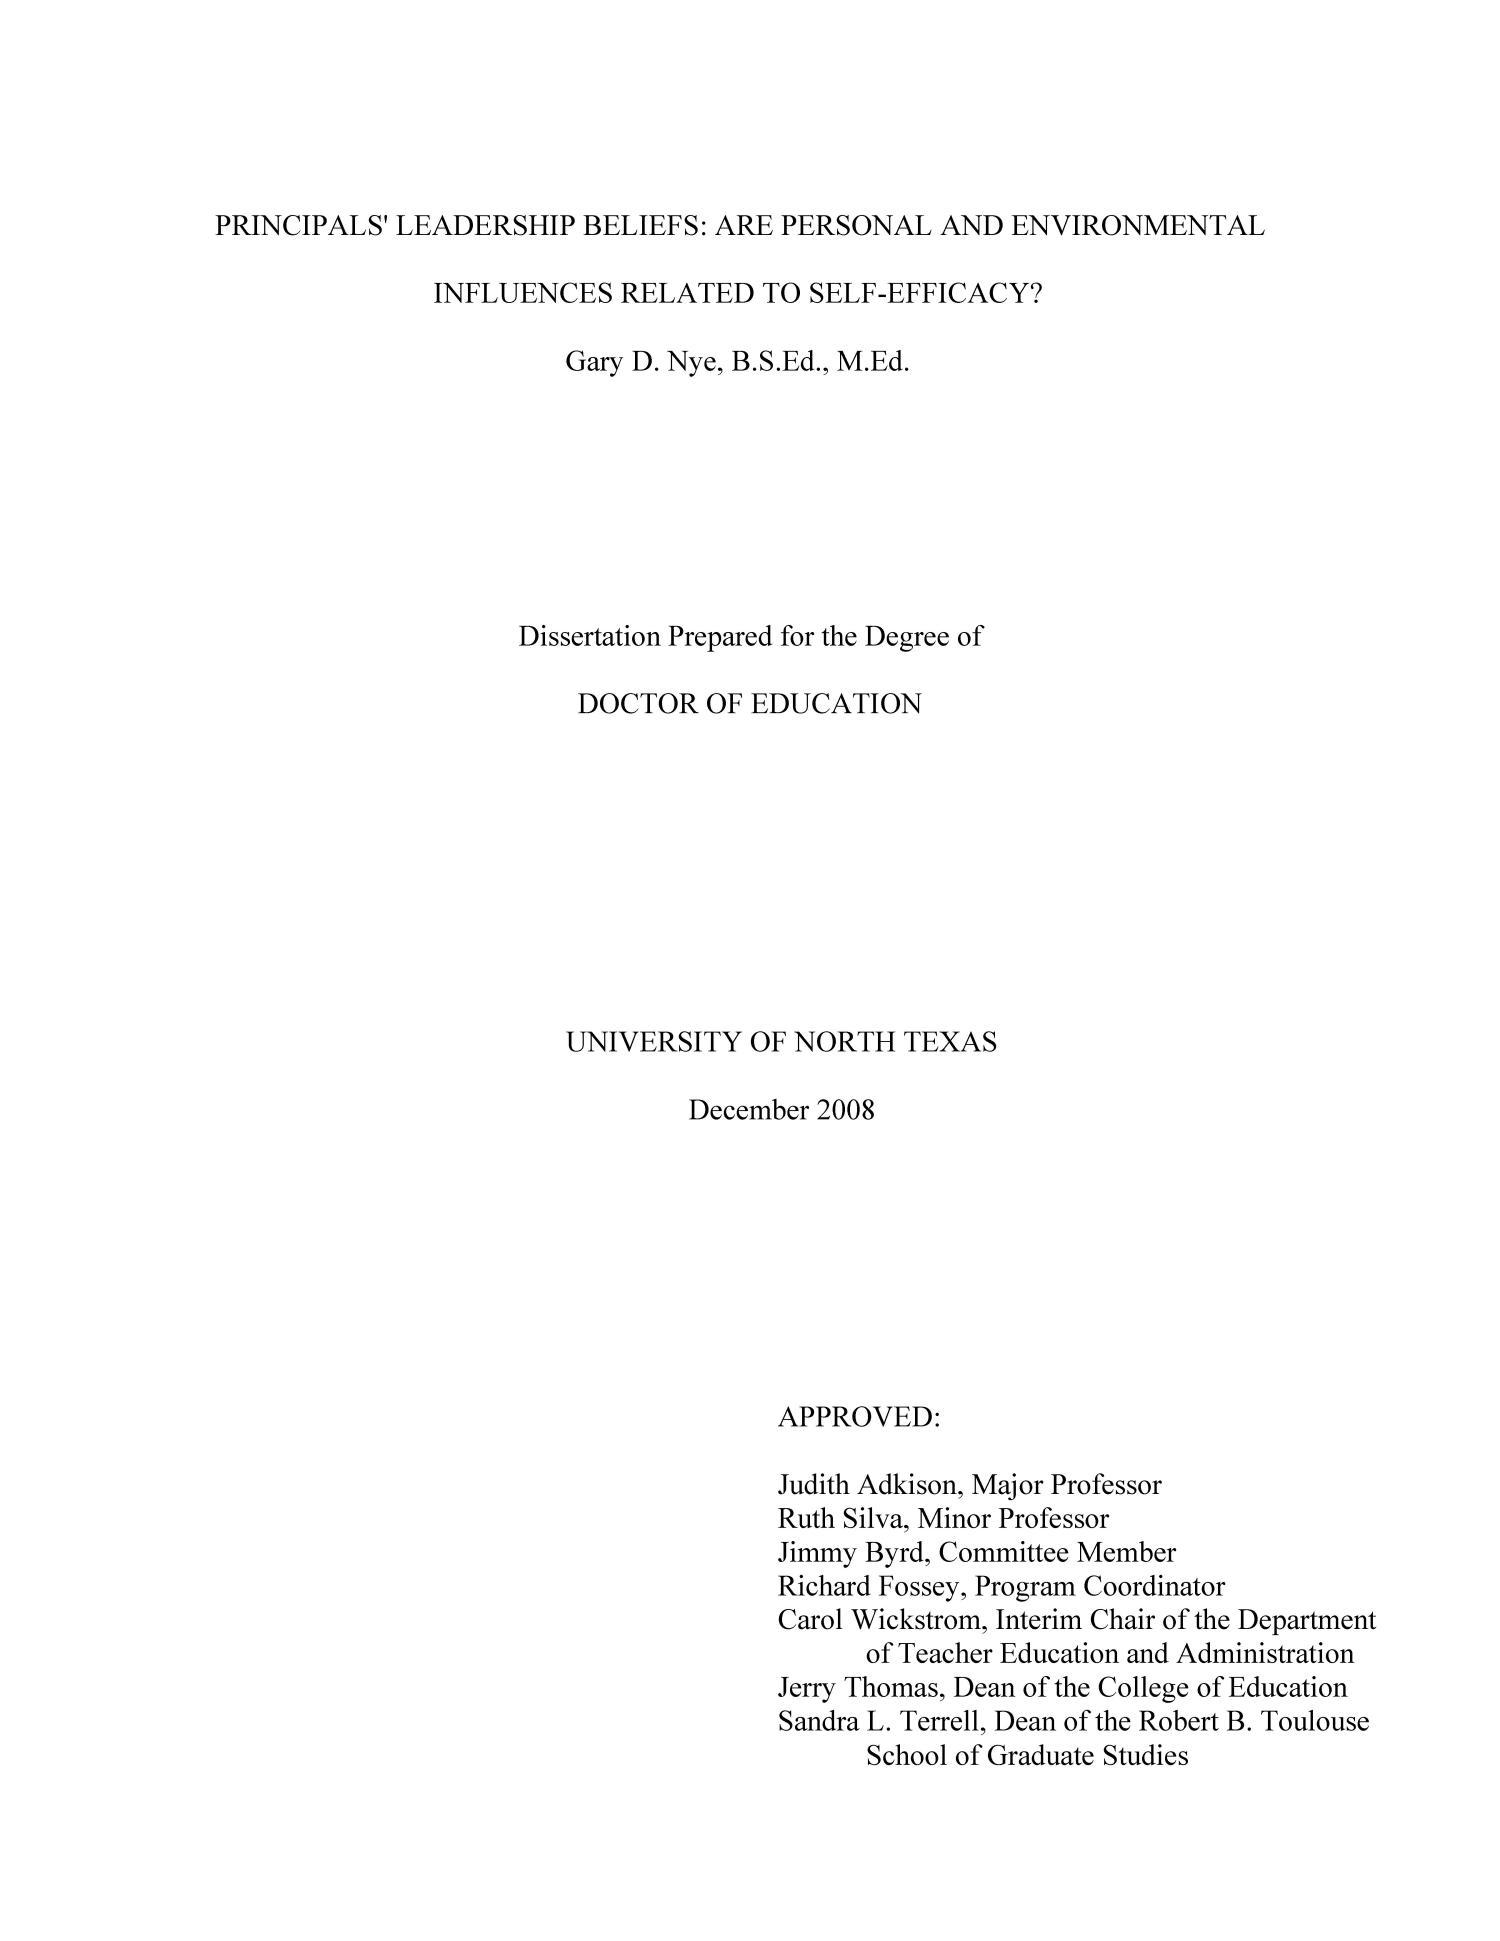 Dissertation self efficacy scale